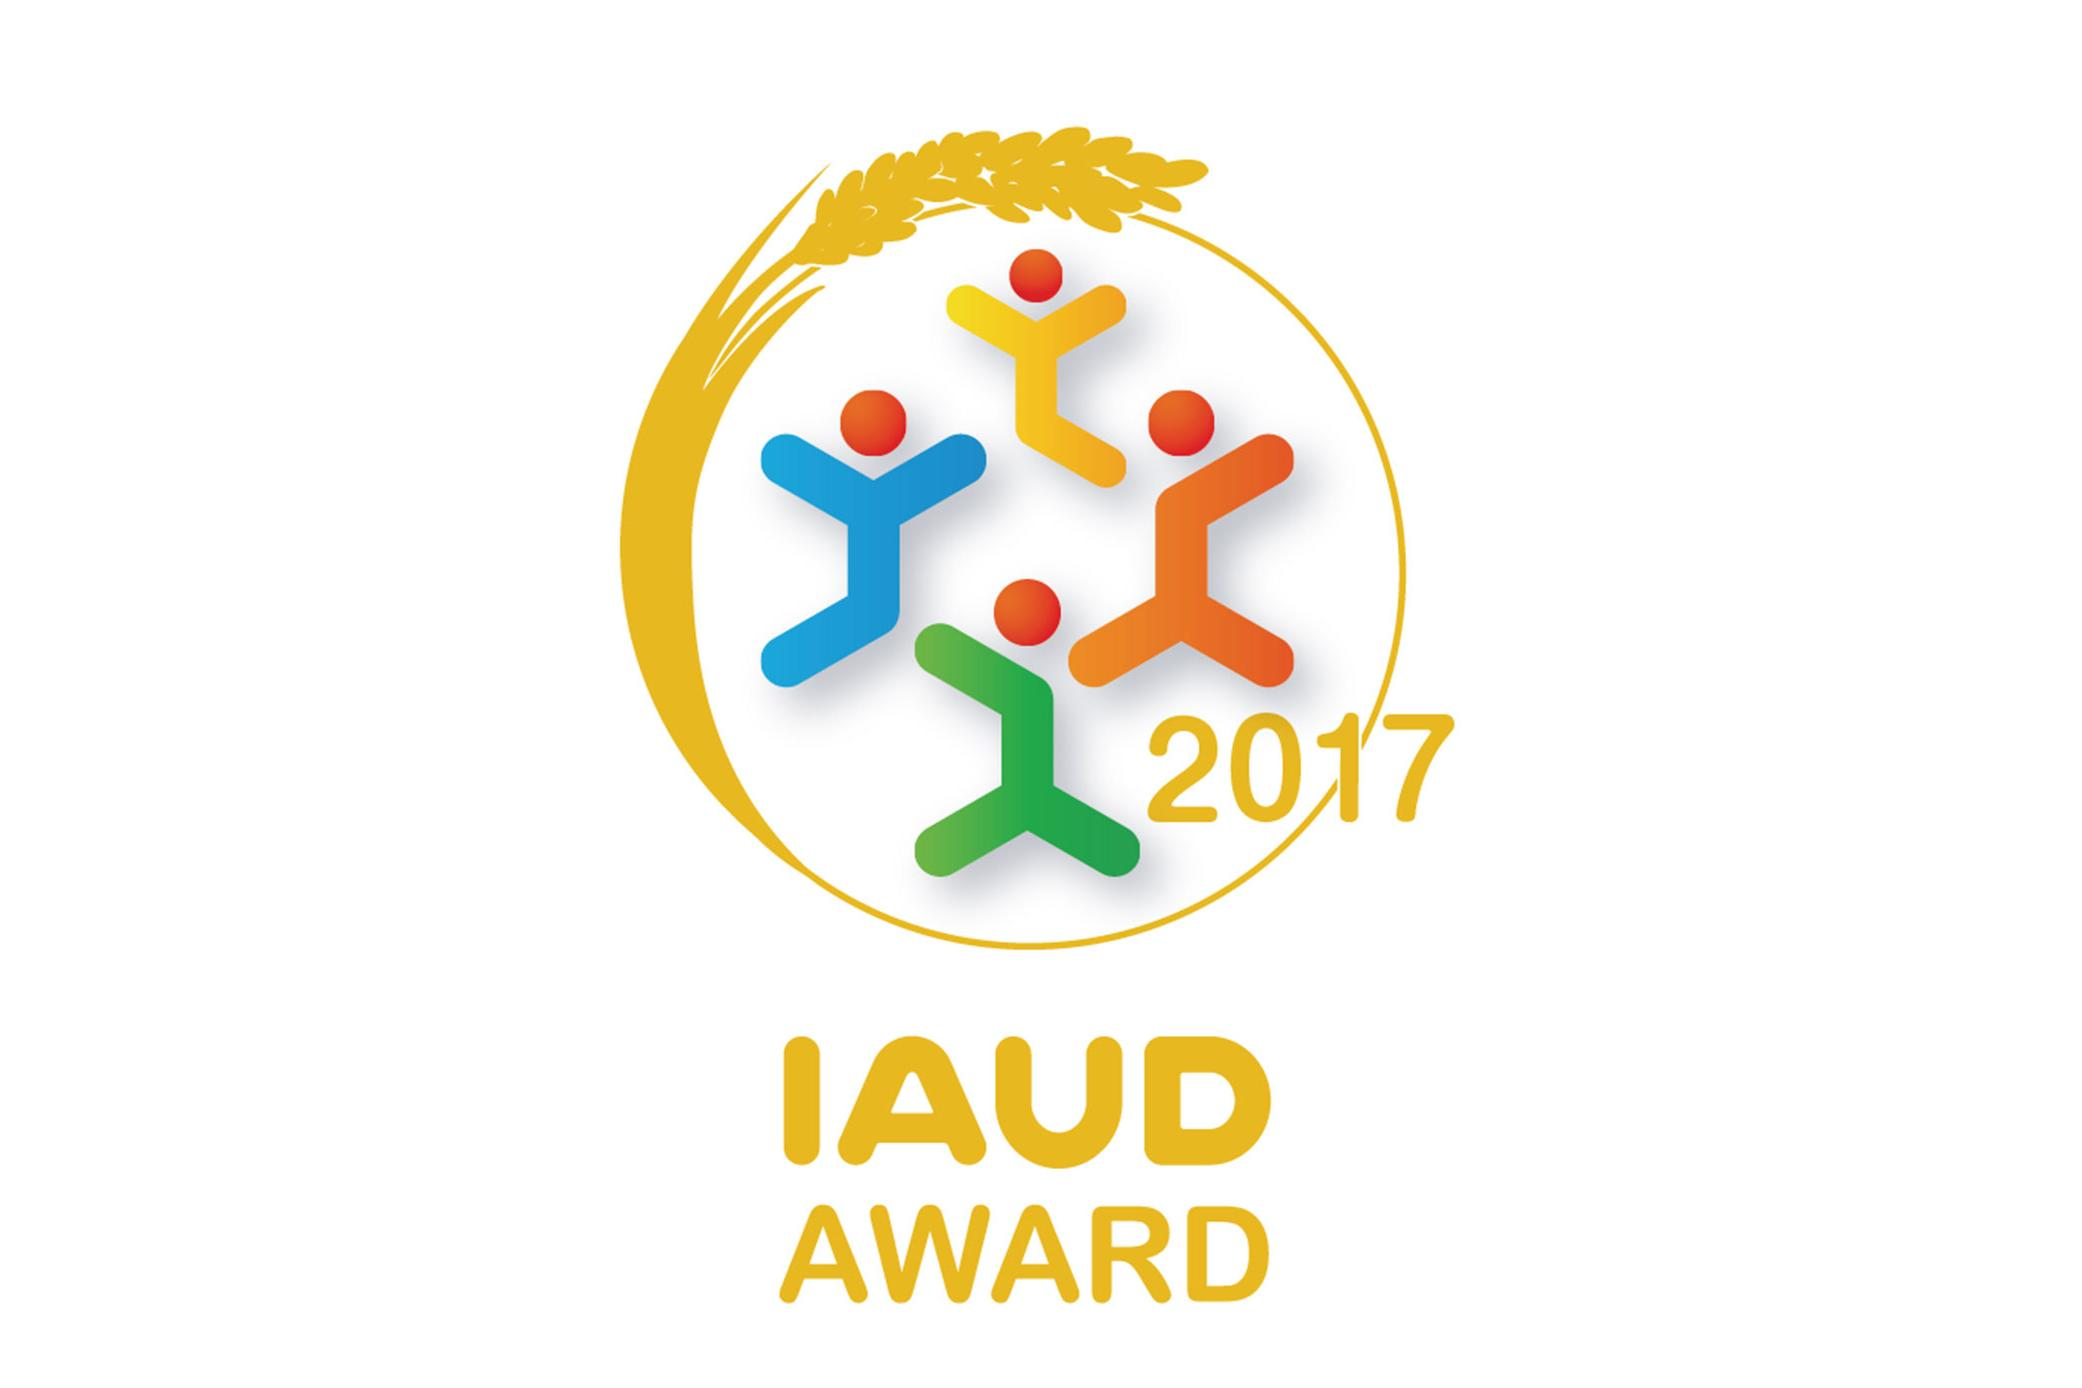 image: IAUD Award 2017 Gold Award logo